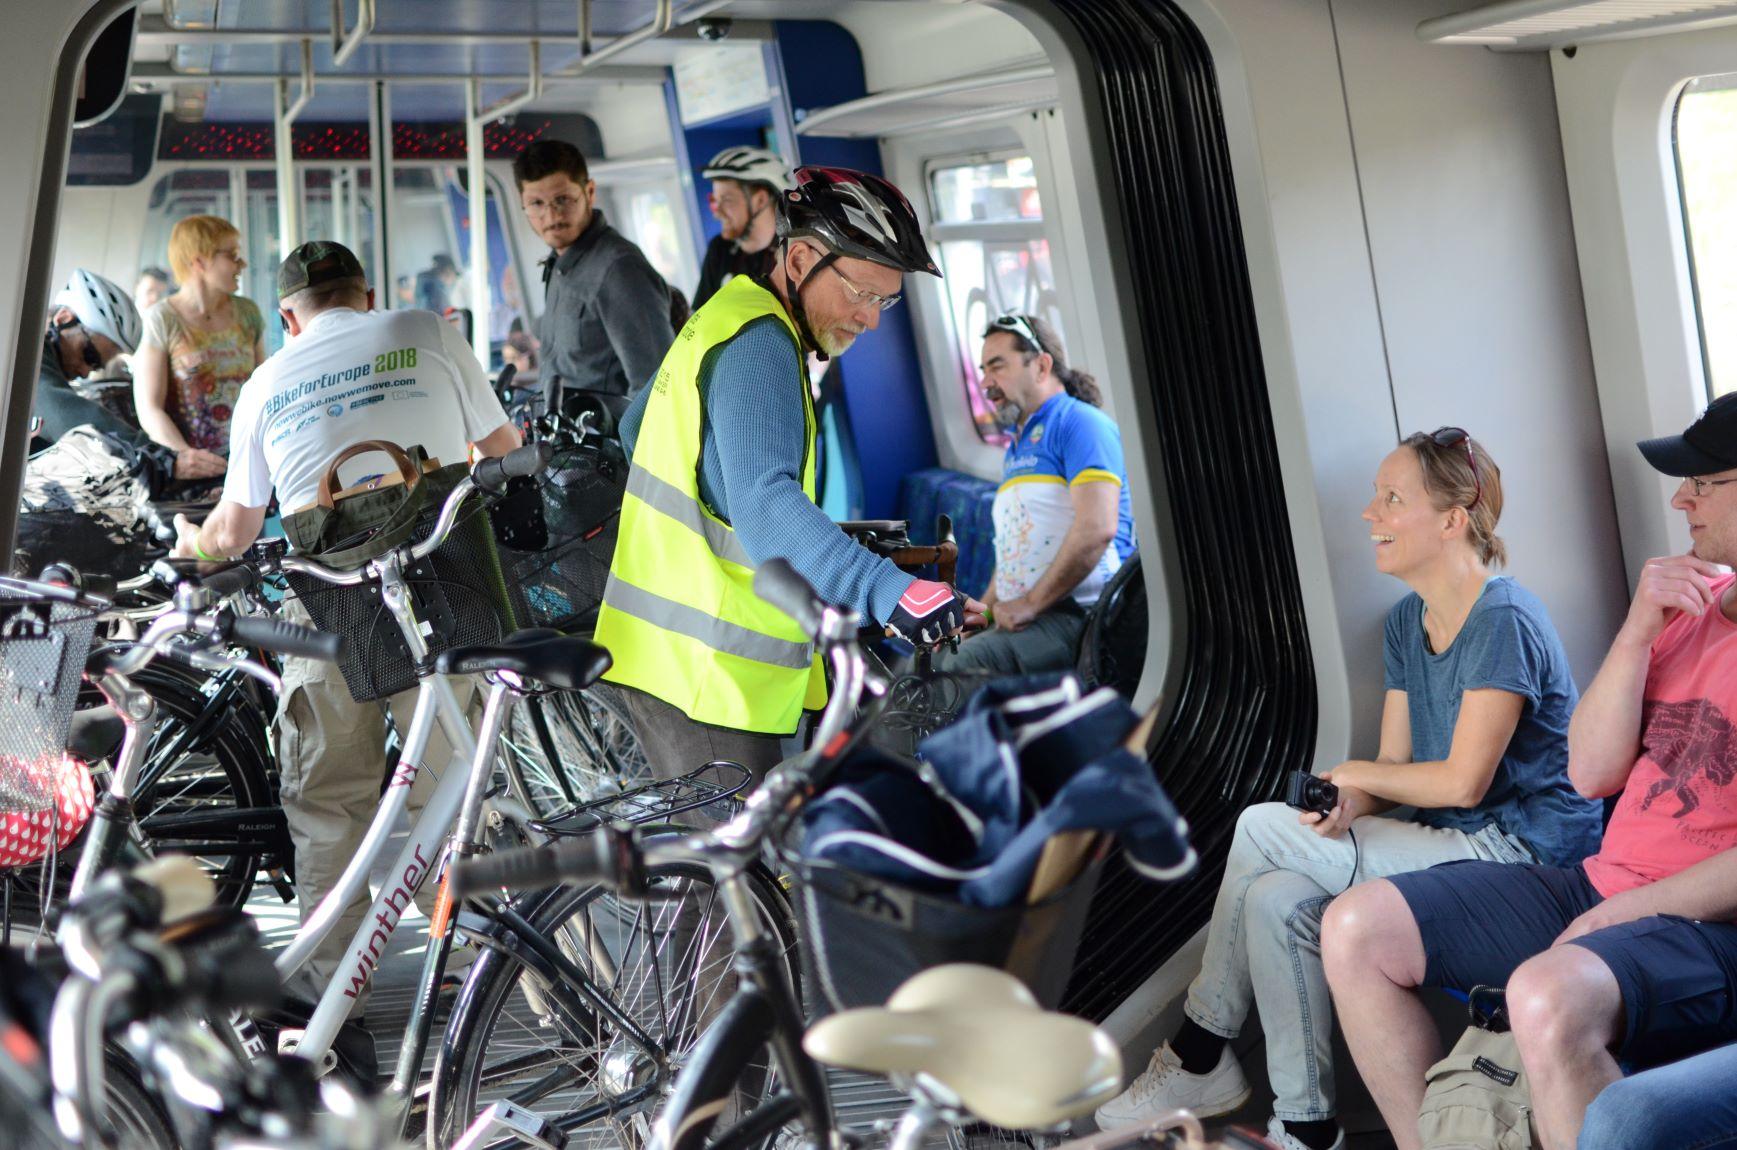 bikesintrain_s